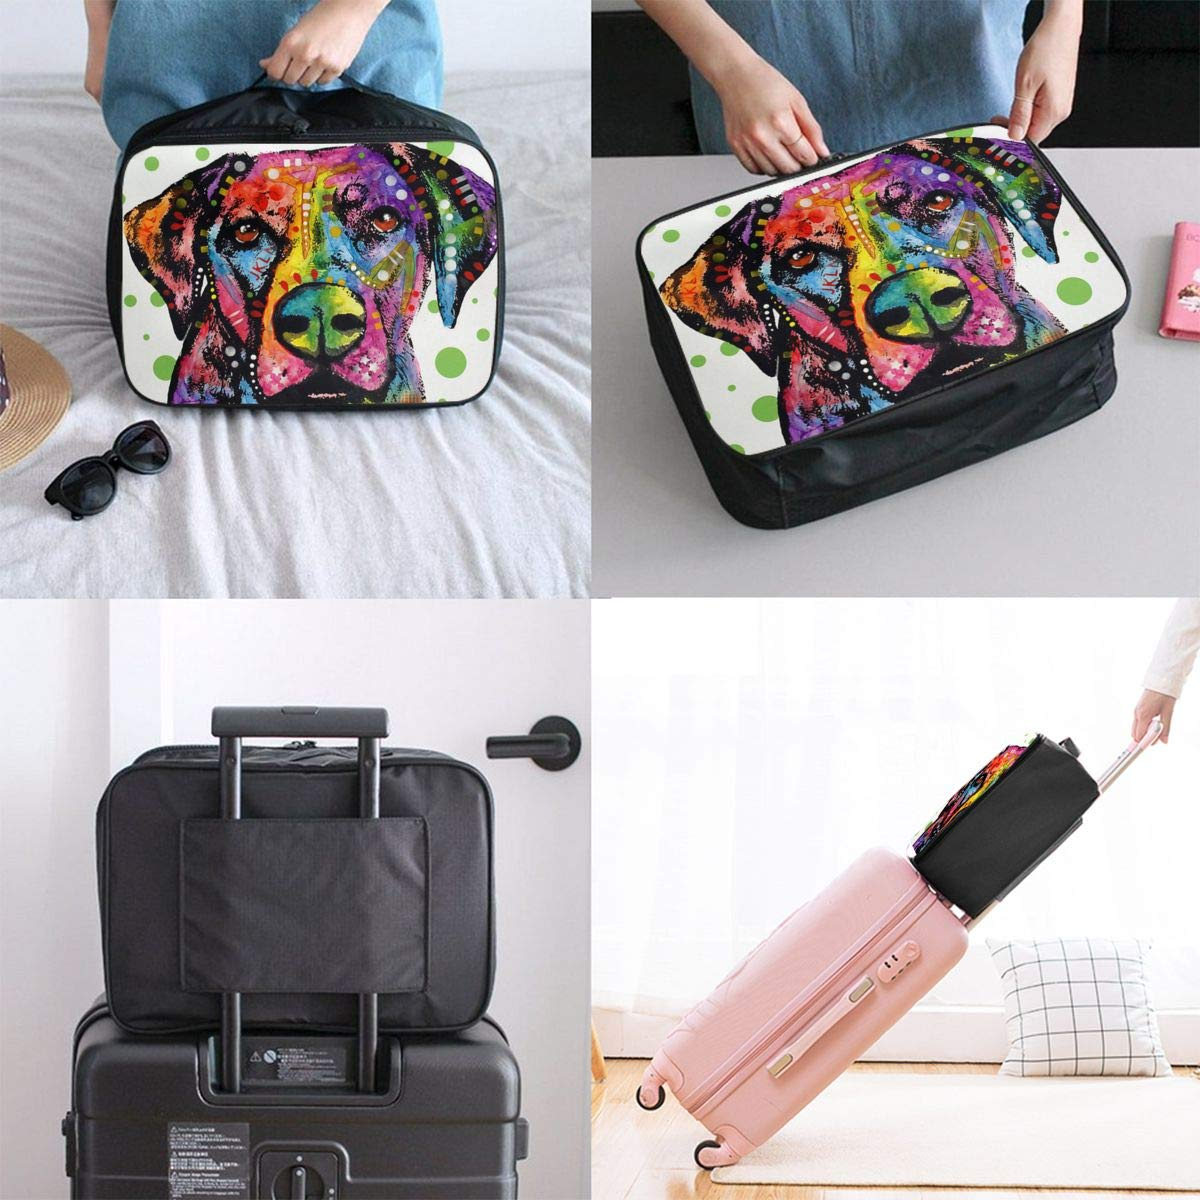 Color Art Guide Dog Canvas Travel Weekender Bag,Fashion Custom Lightweight Large Capacity Portable Luggage Bag,Suitcase Trolley Bag